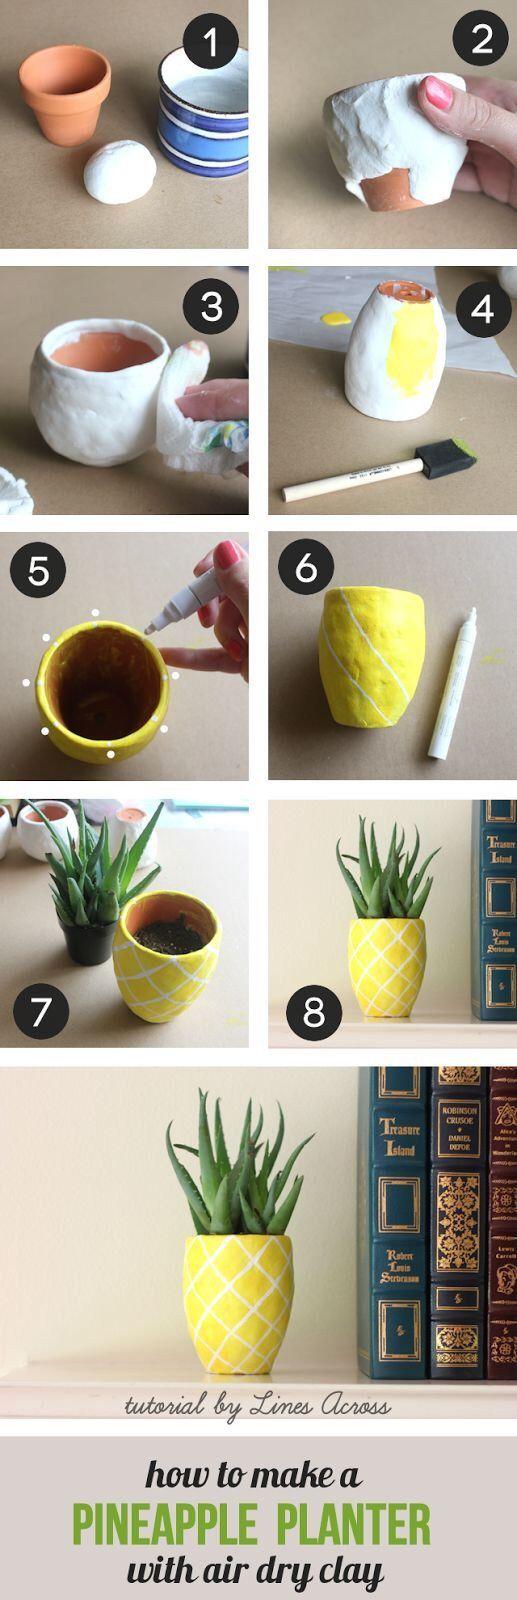 Blumentopf aus Fimo - DIY